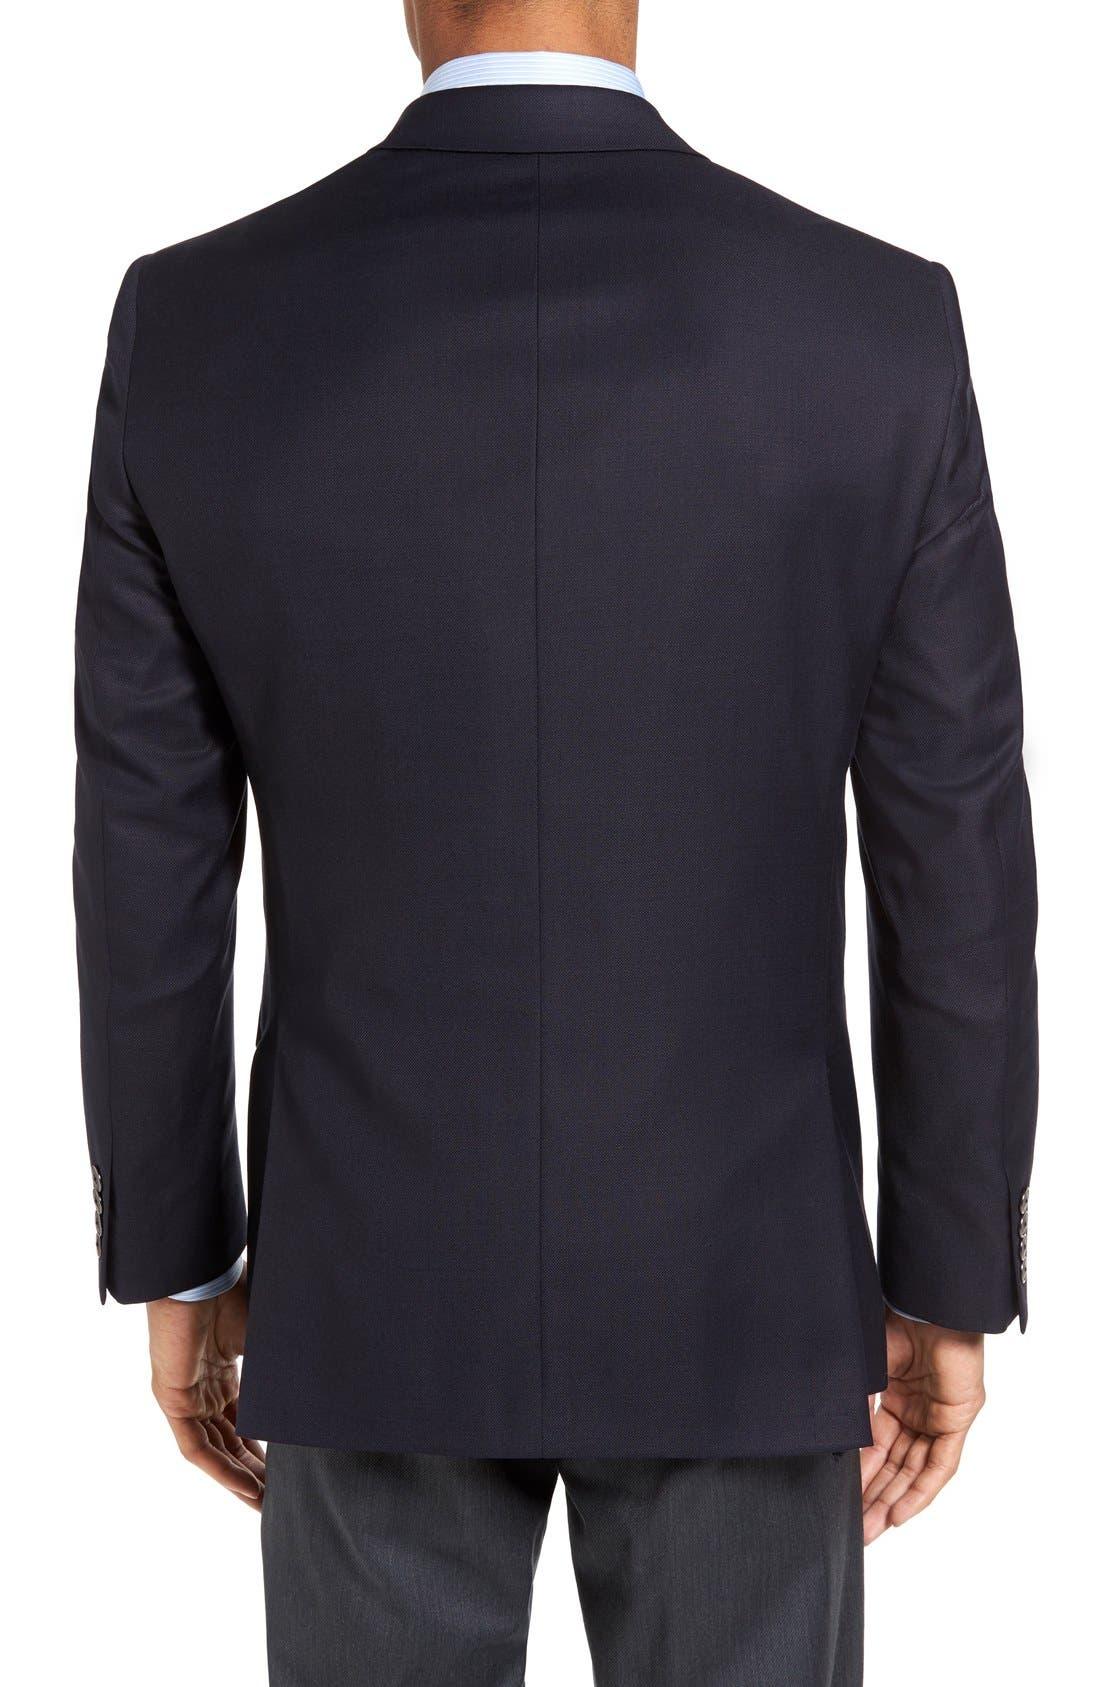 HART SCHAFFNER MARX, New York Classic Fit Wool Blend Blazer, Alternate thumbnail 9, color, NAVY